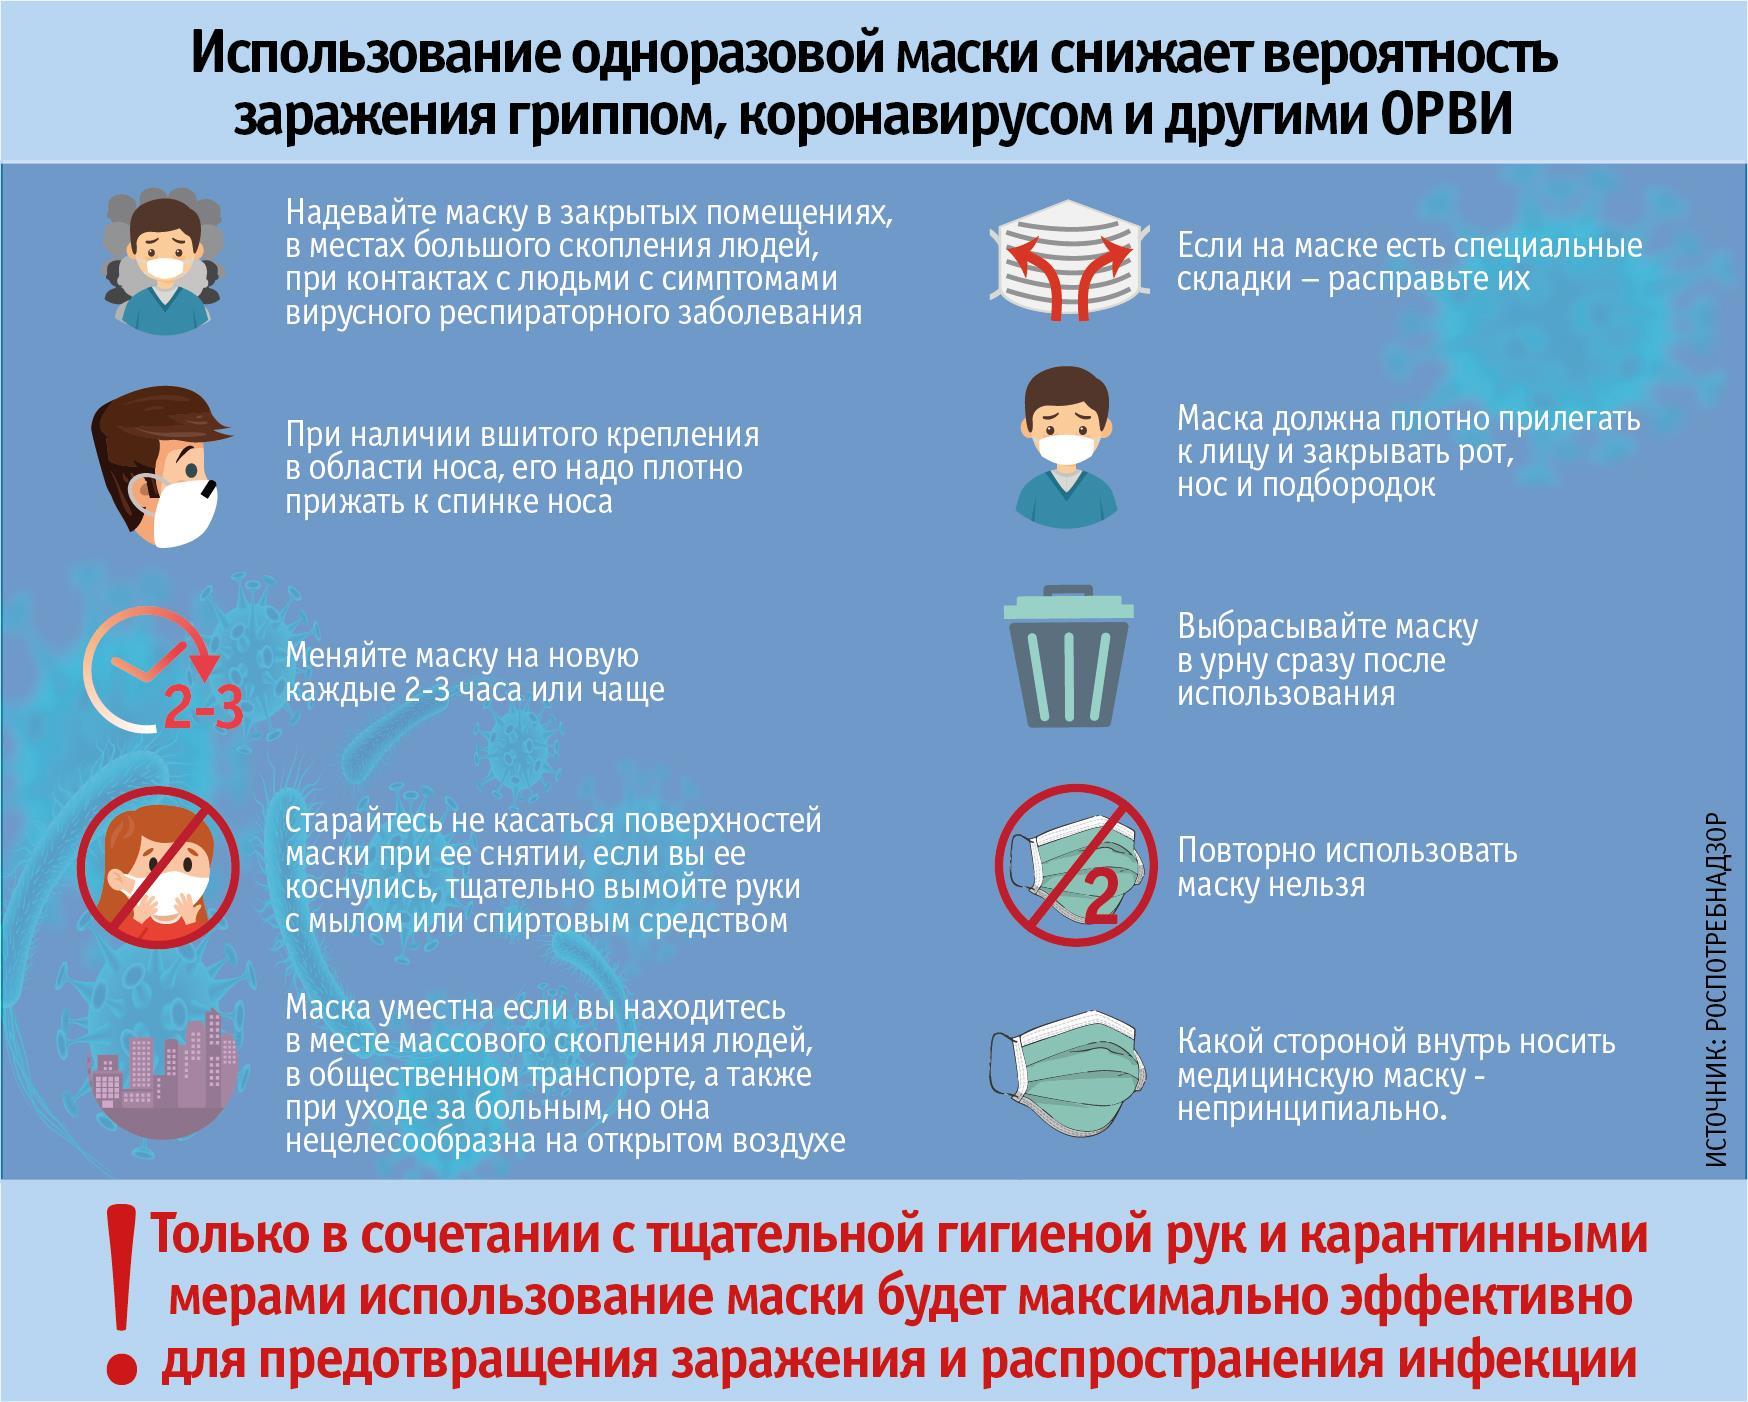 ispolzovanie_medicinskoj_maski